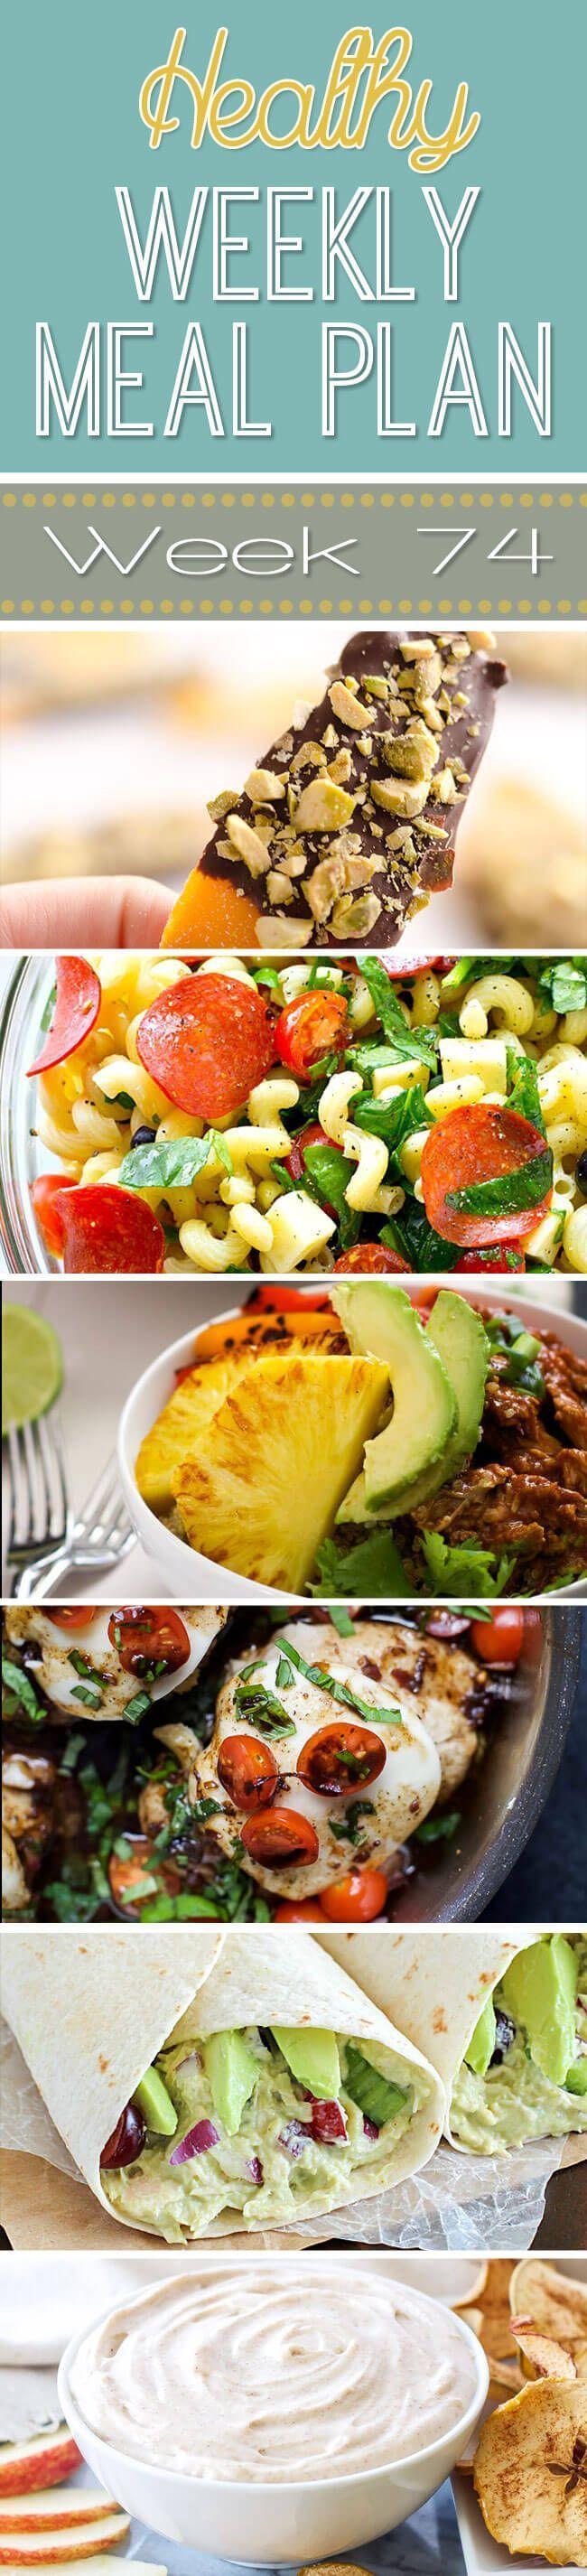 Healthy Weekly Meal Plan #74